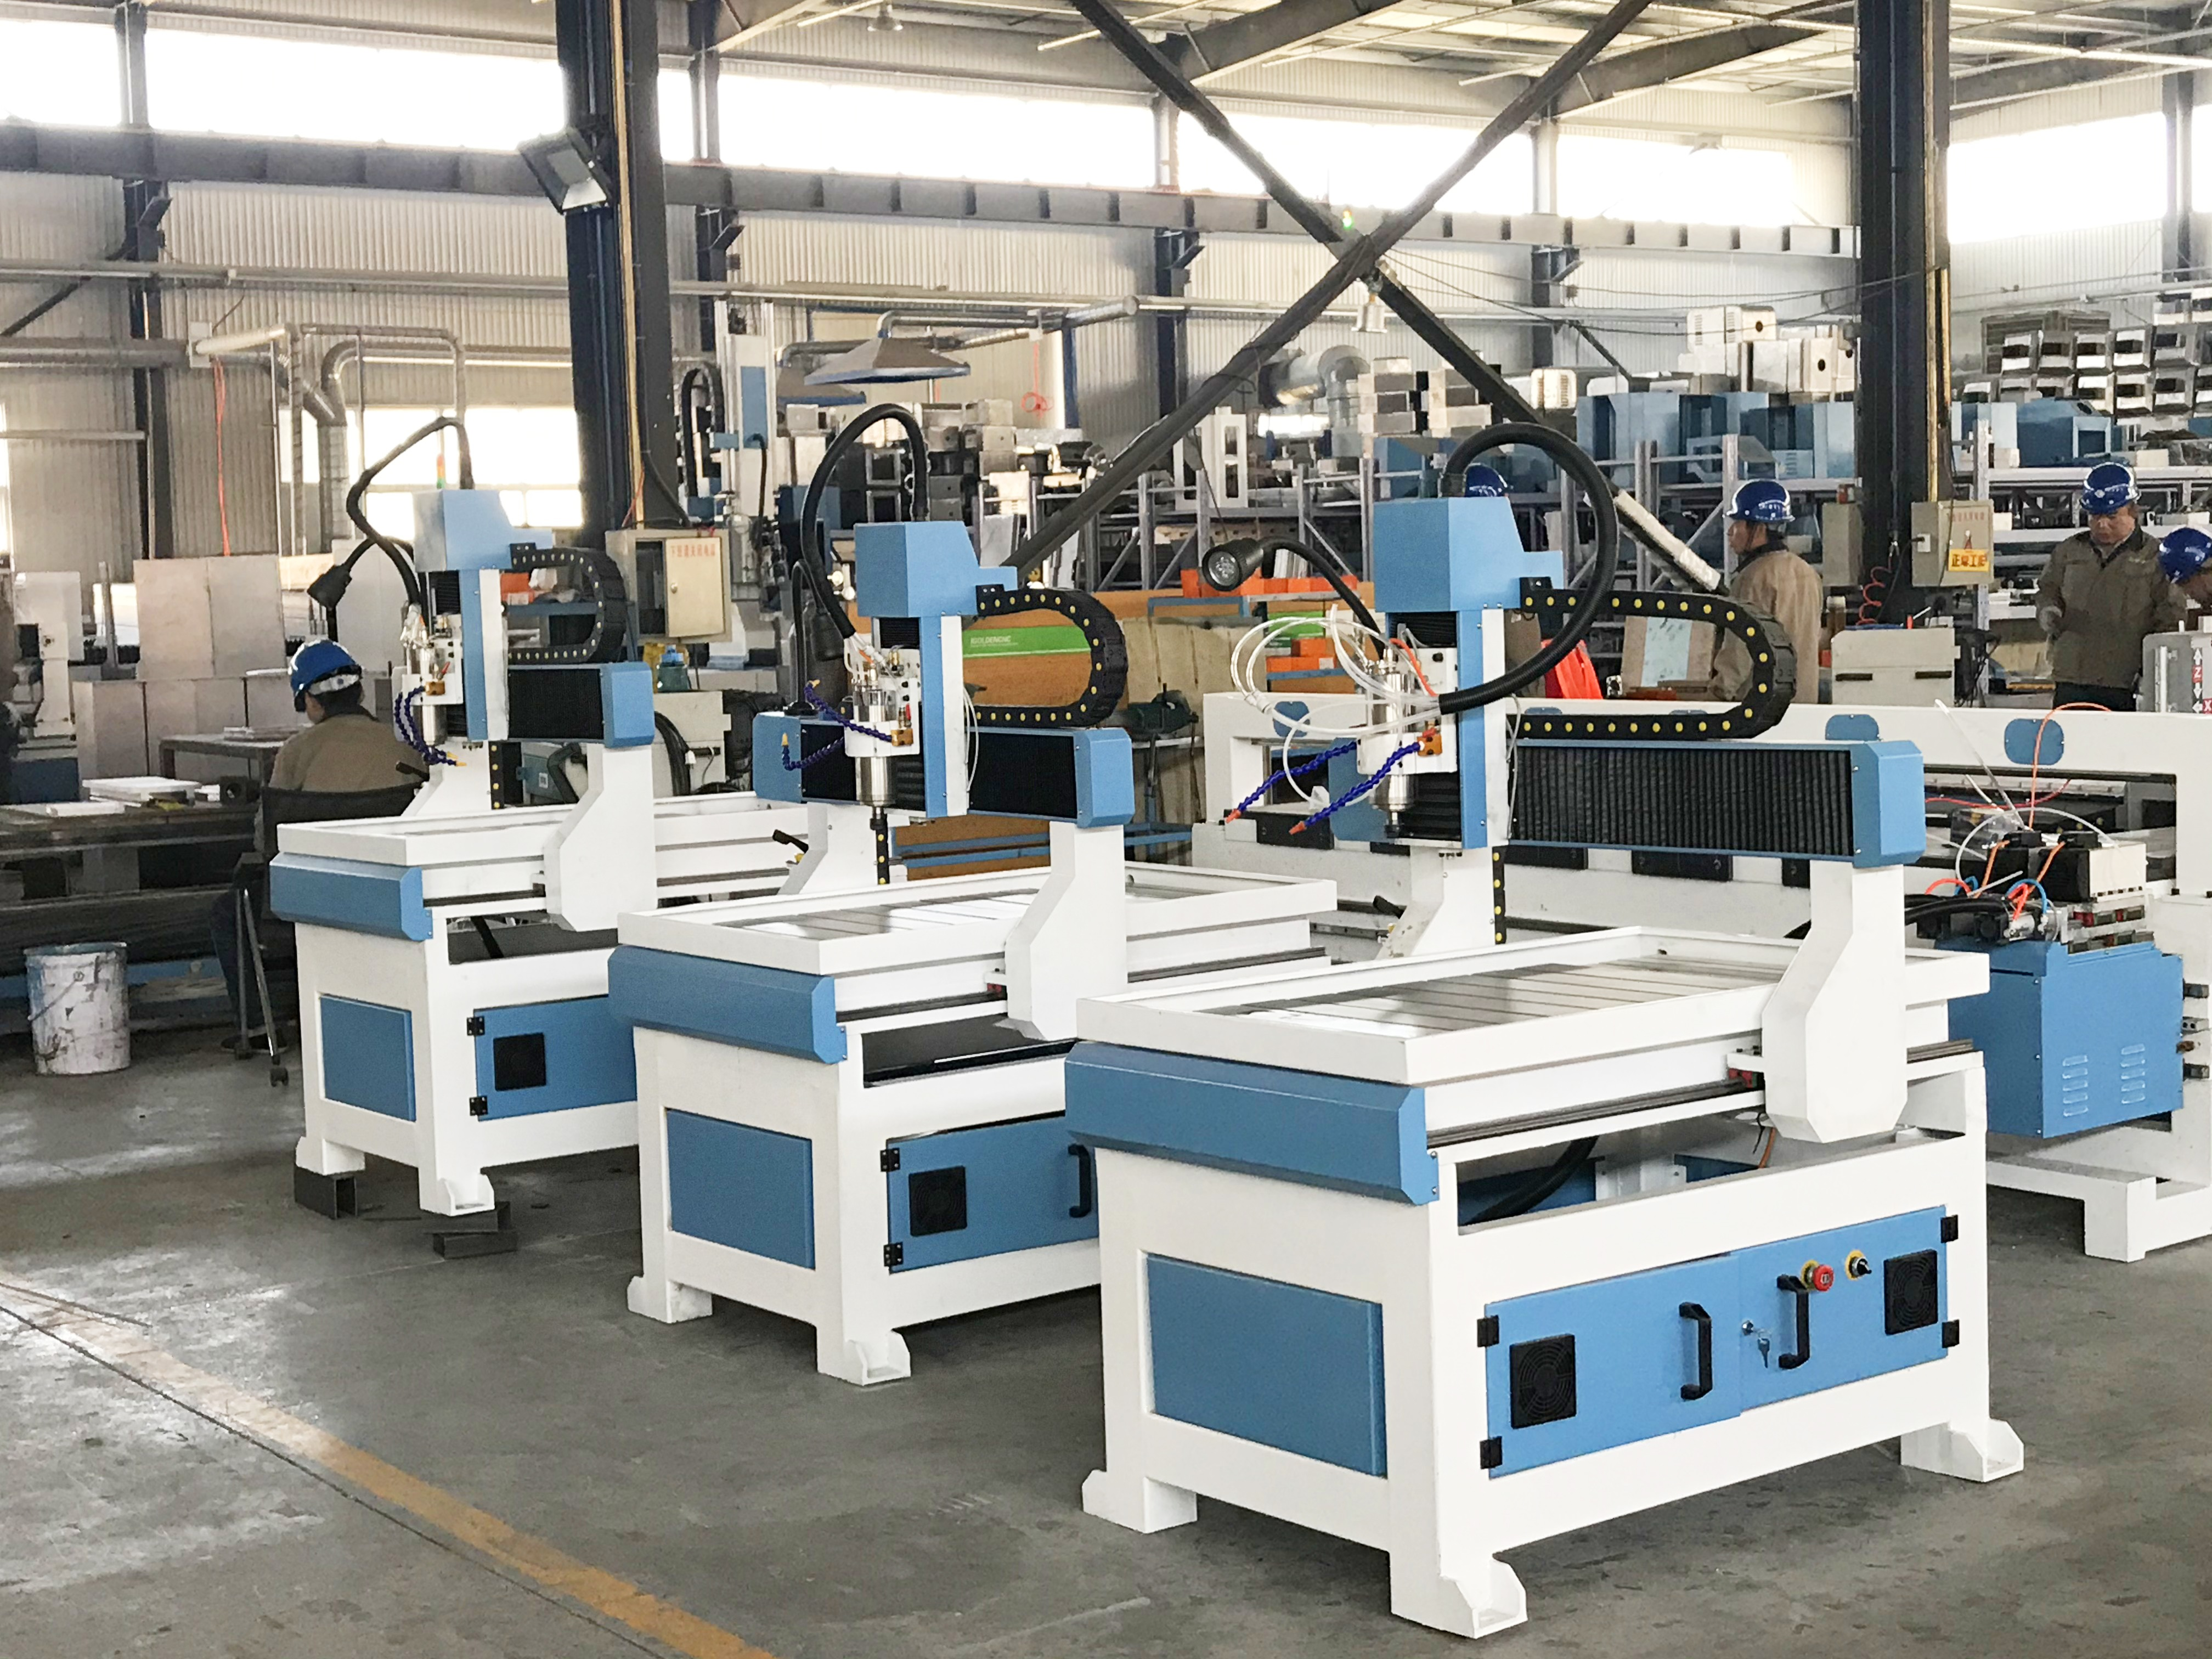 China Quality 6090 CNC Router 1.5kw 2.2kw Desktop Advertising Cnc 3d Wood Engraving Machine Price